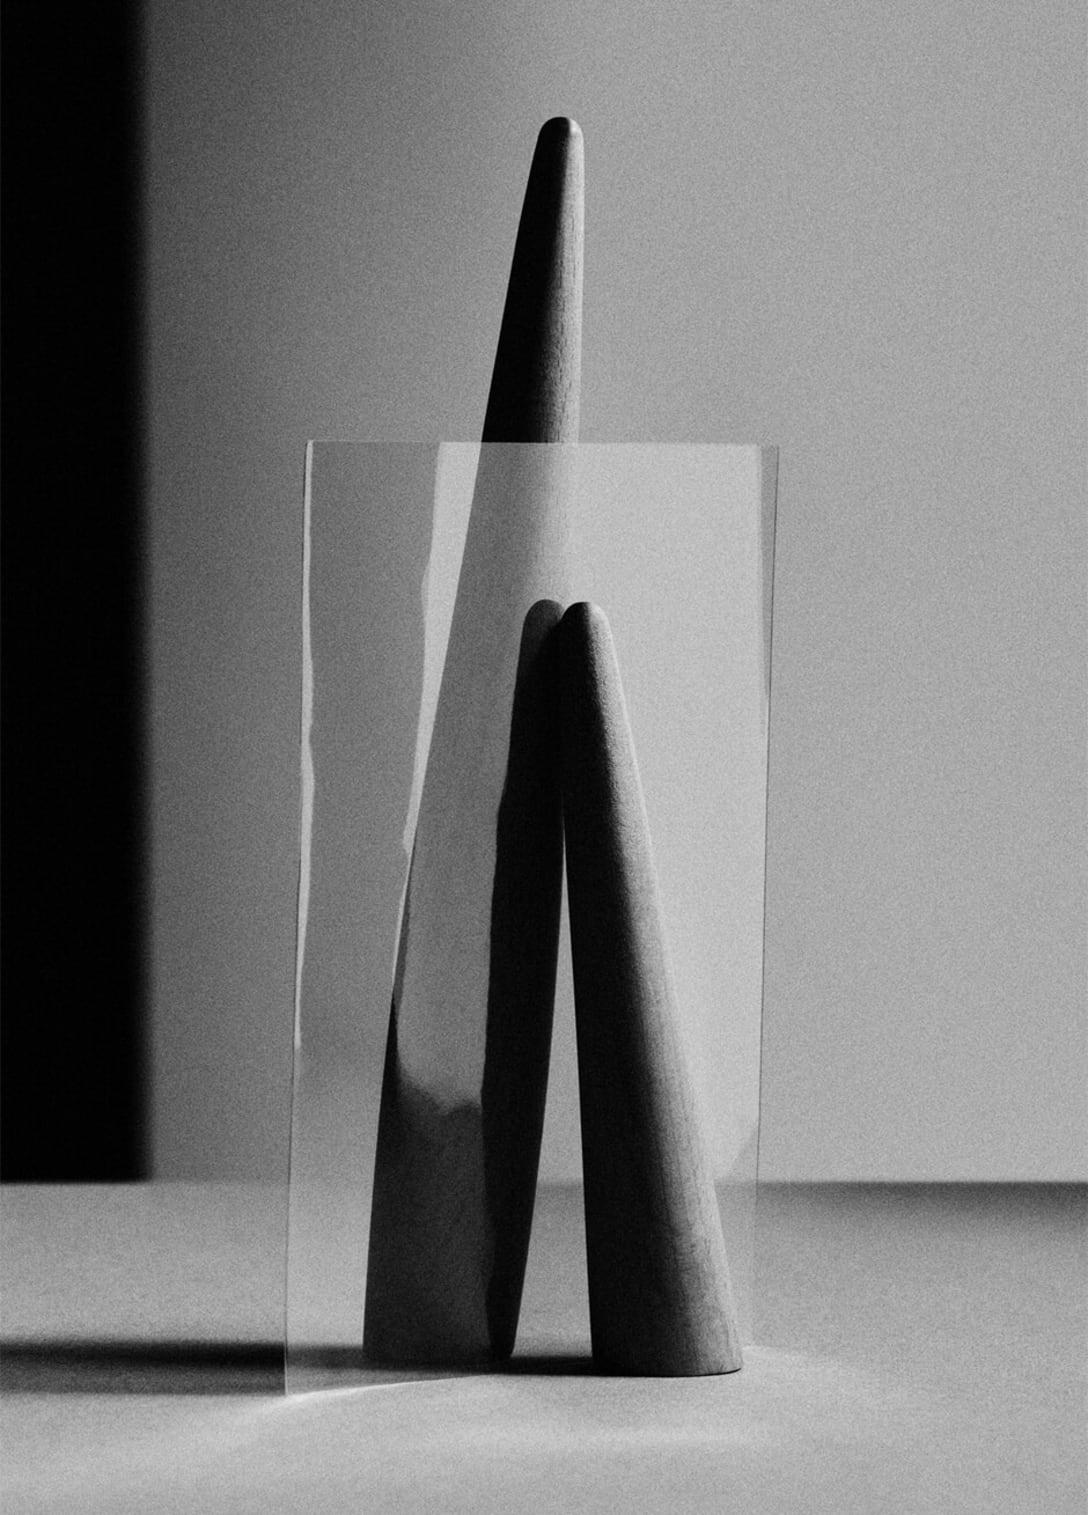 「Punctum」シリーズより Untitled, 2020